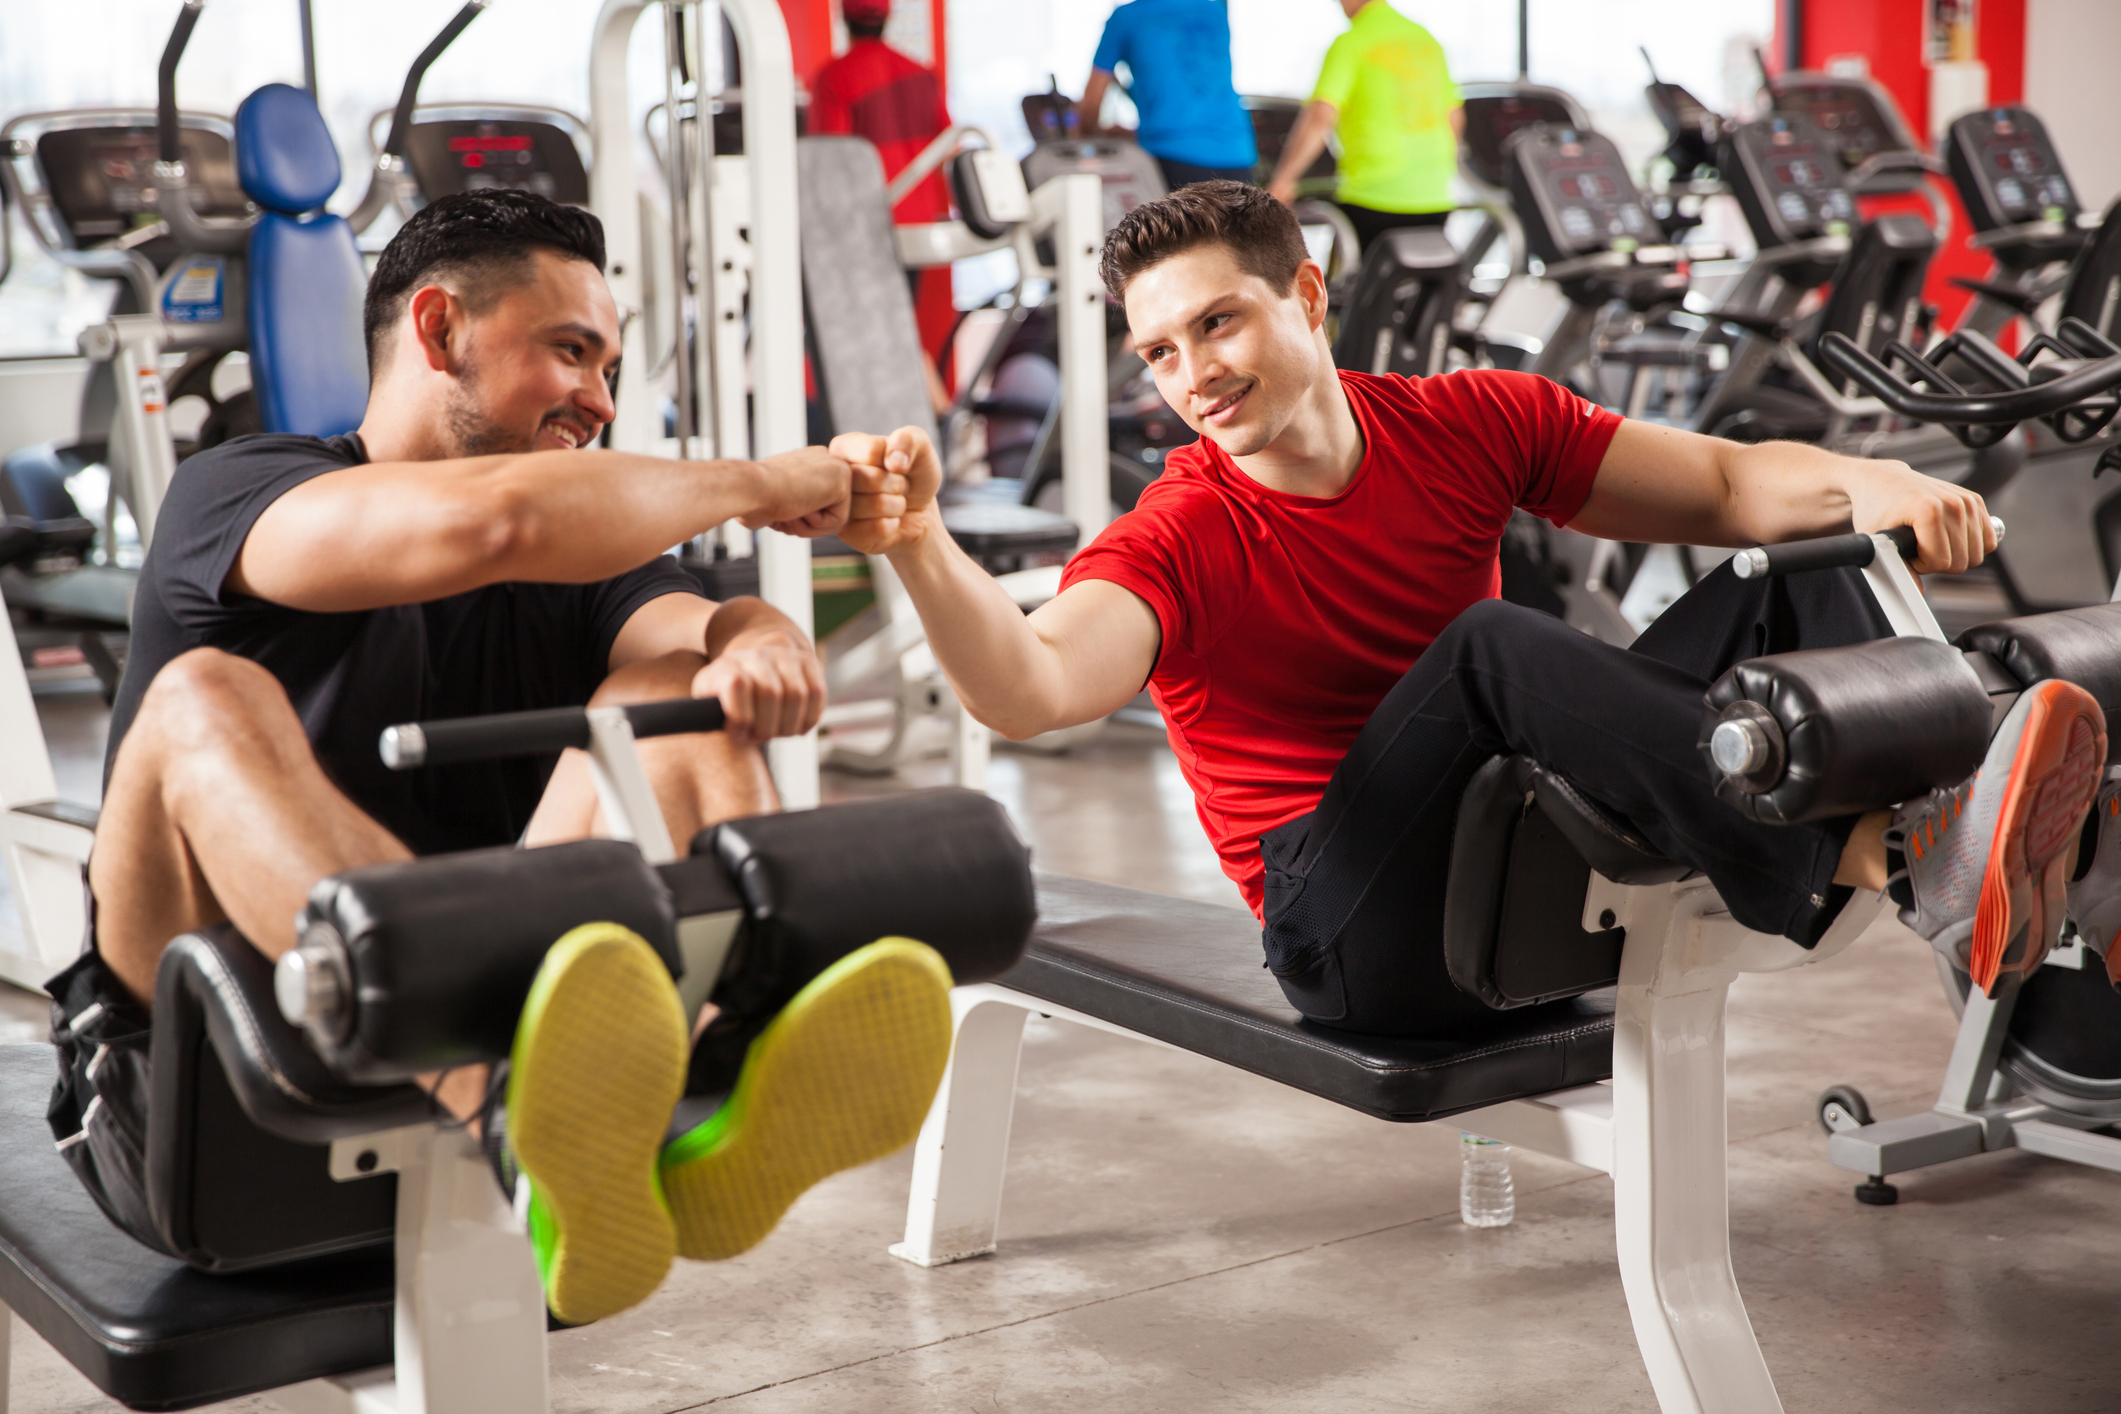 fist bump at gym